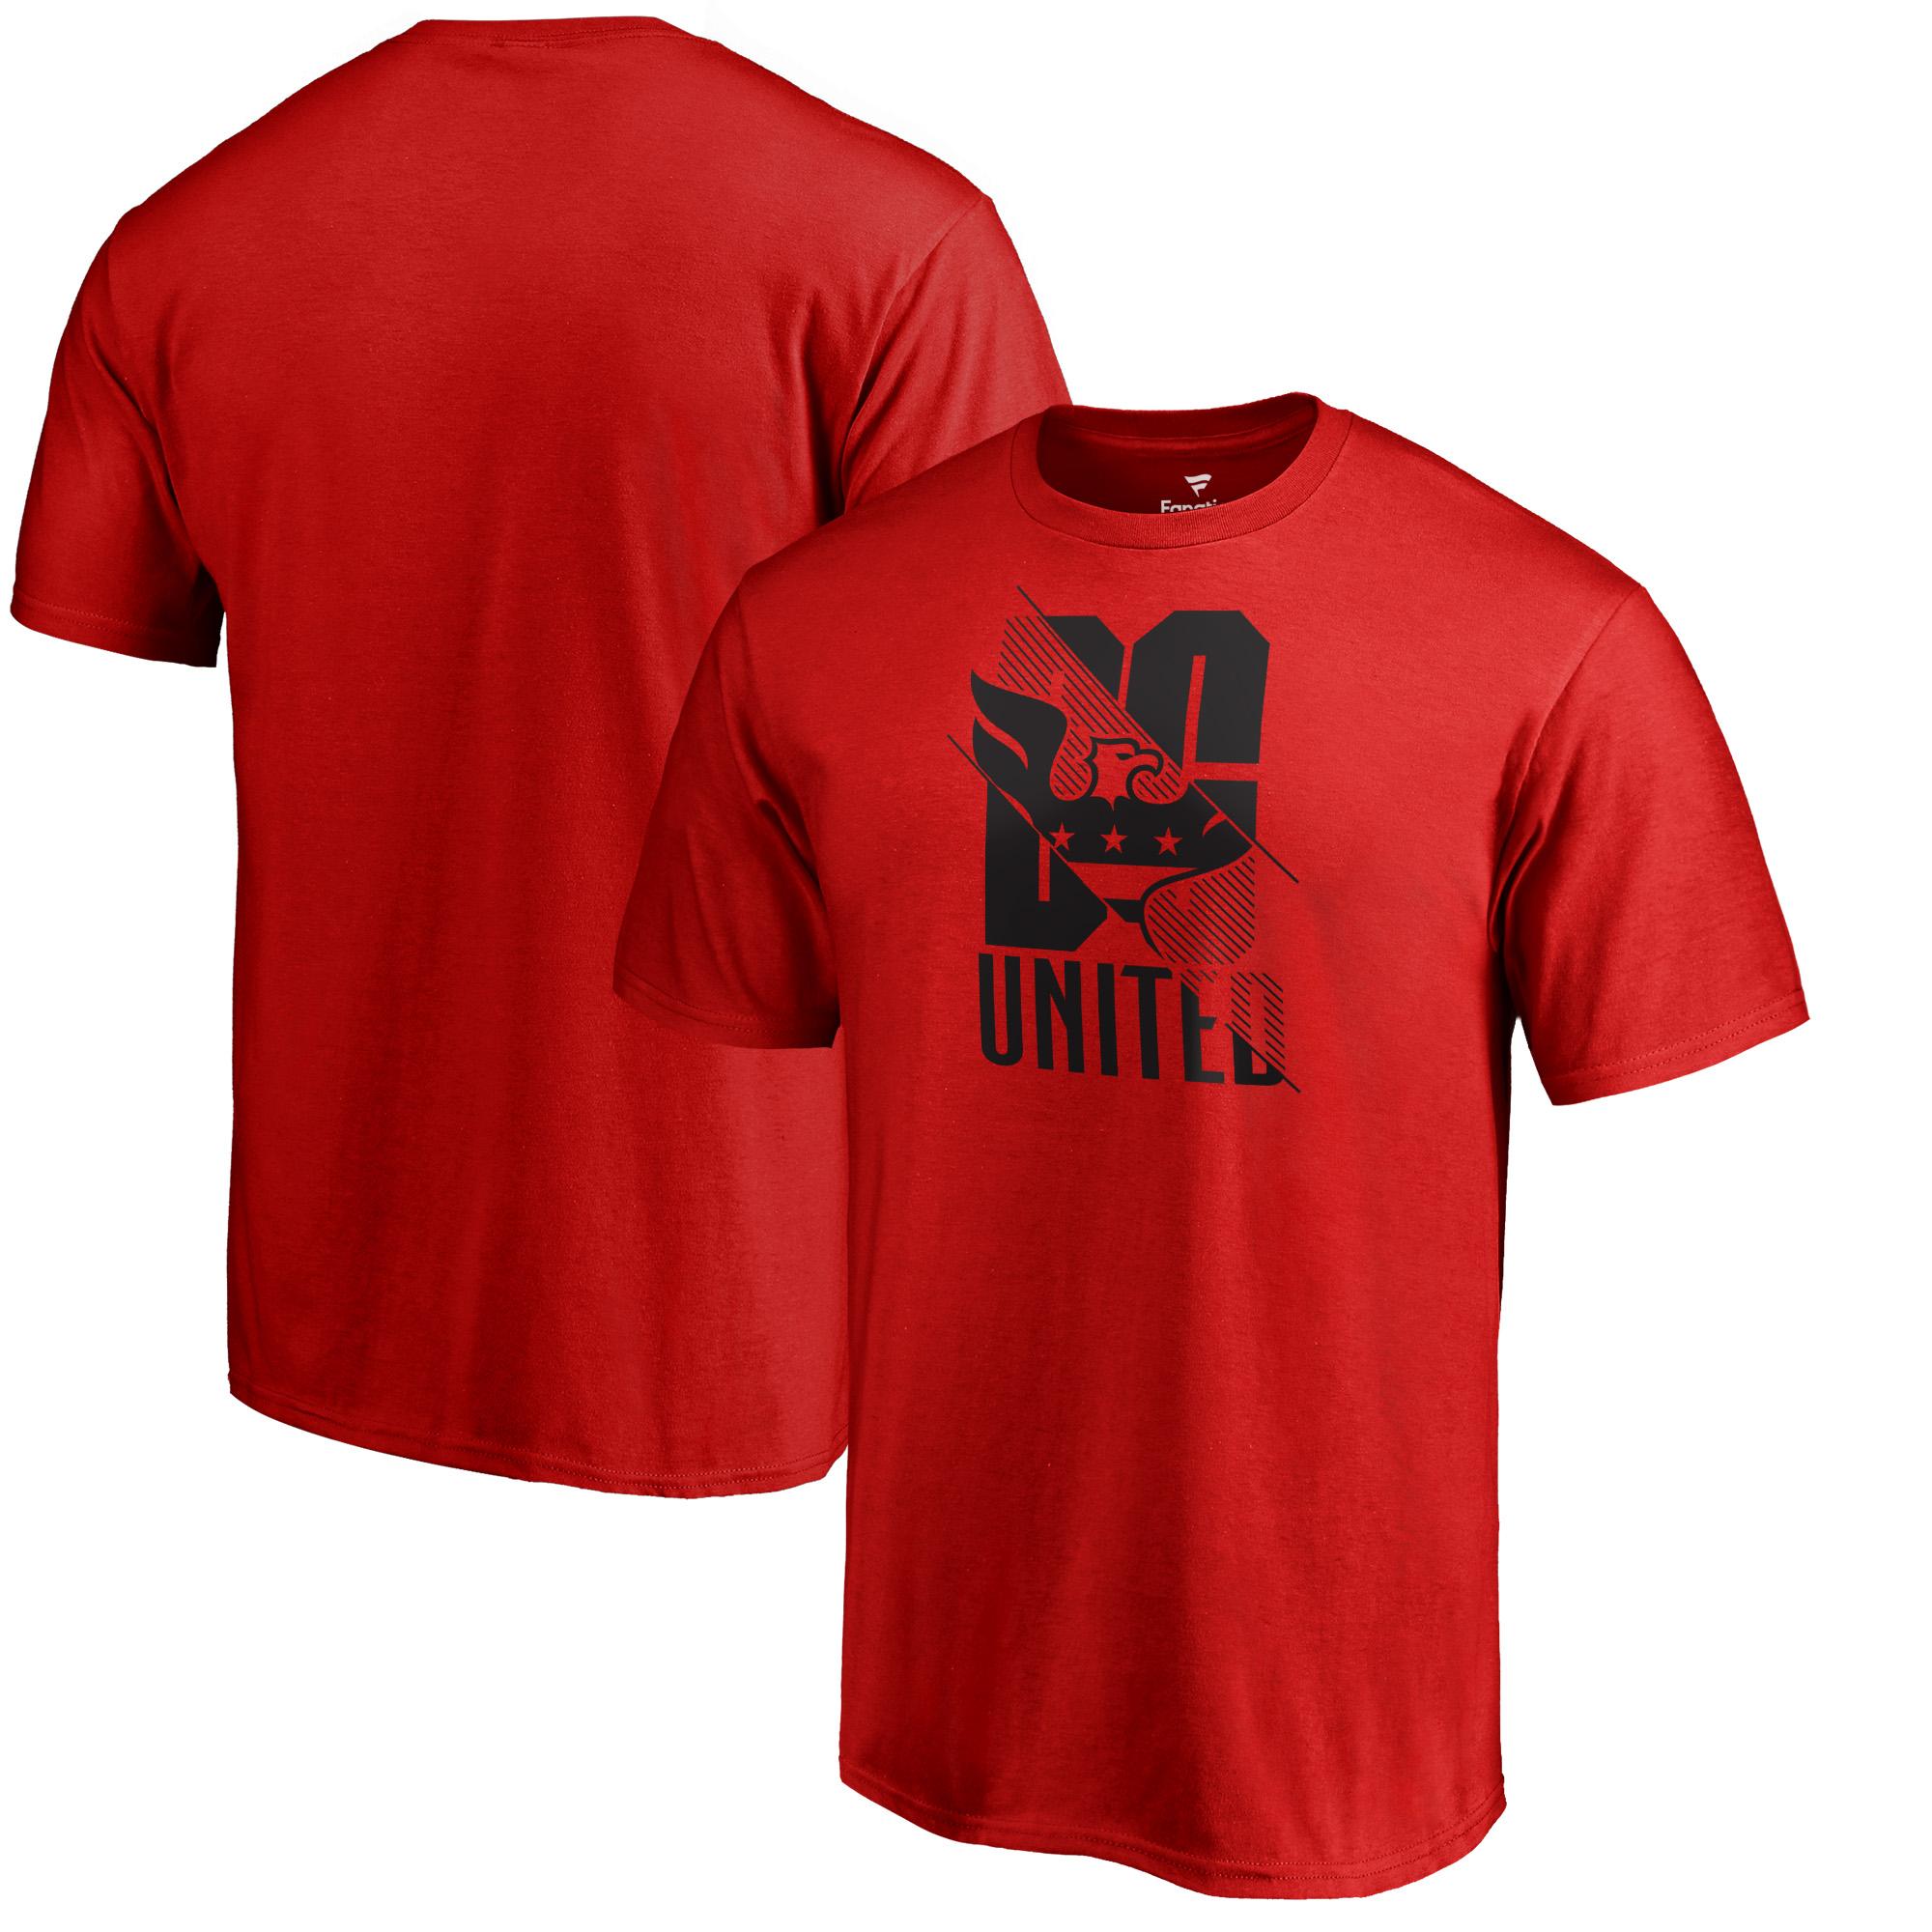 D.C. United Fanatics Branded League Trend Alternate T-Shirt - Red